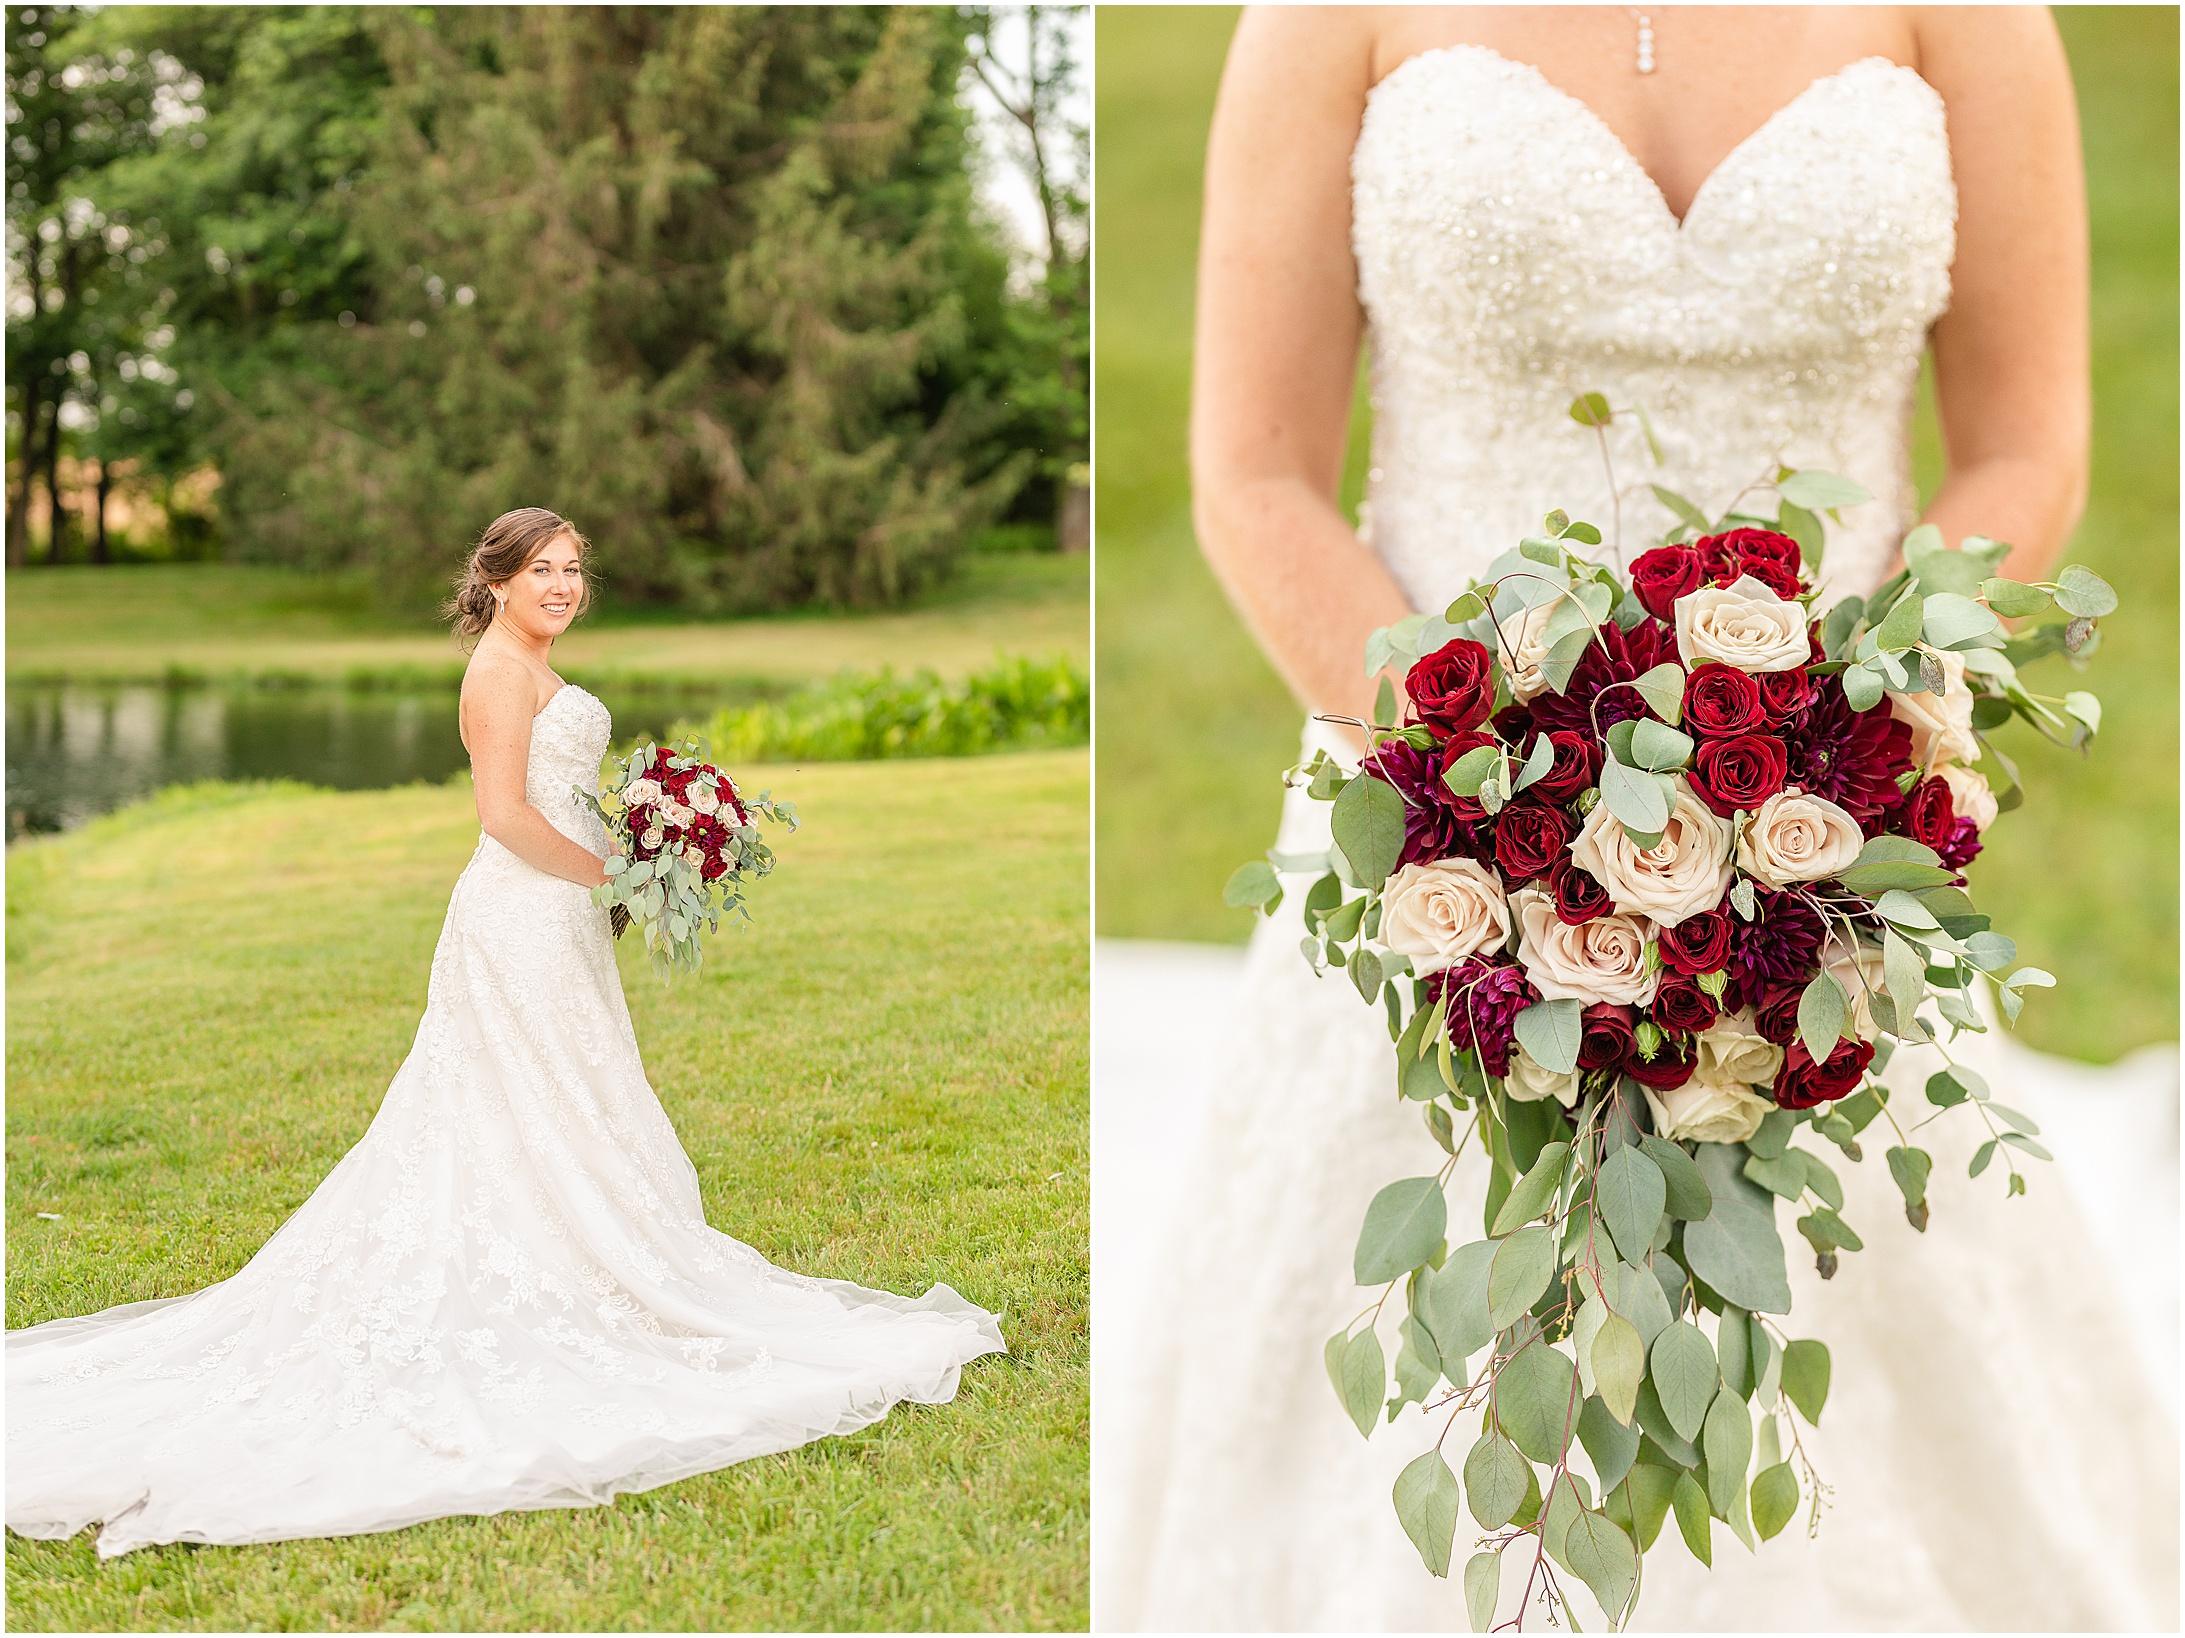 The-Royer-House-Wedding-Photos_0440.jpg